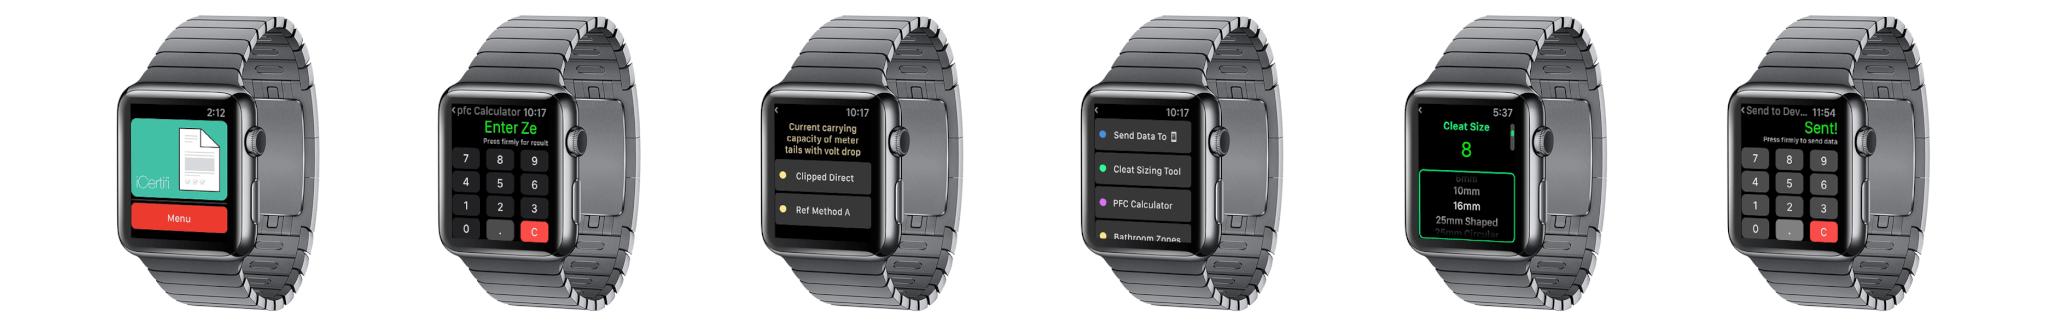 iCertifi on Apple Watch